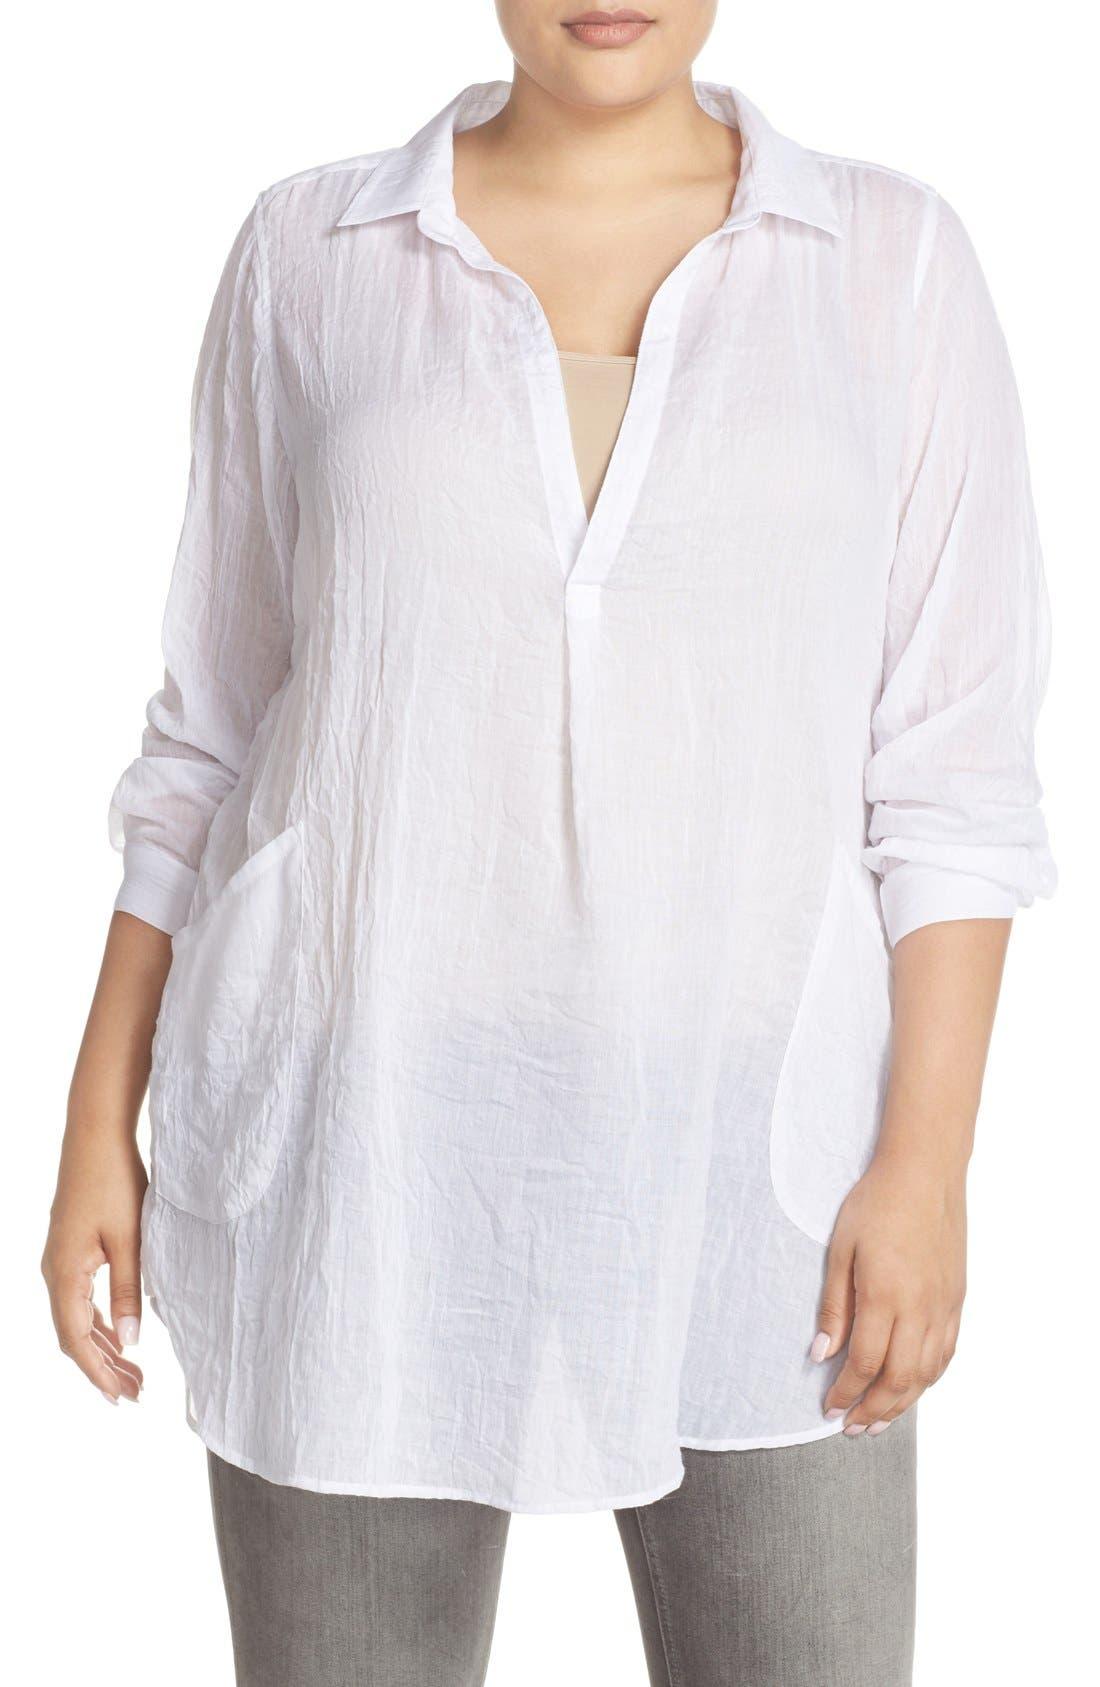 Main Image - Melissa McCarthy Seven7 Patch Pocket Tunic Shirt (Plus Size)